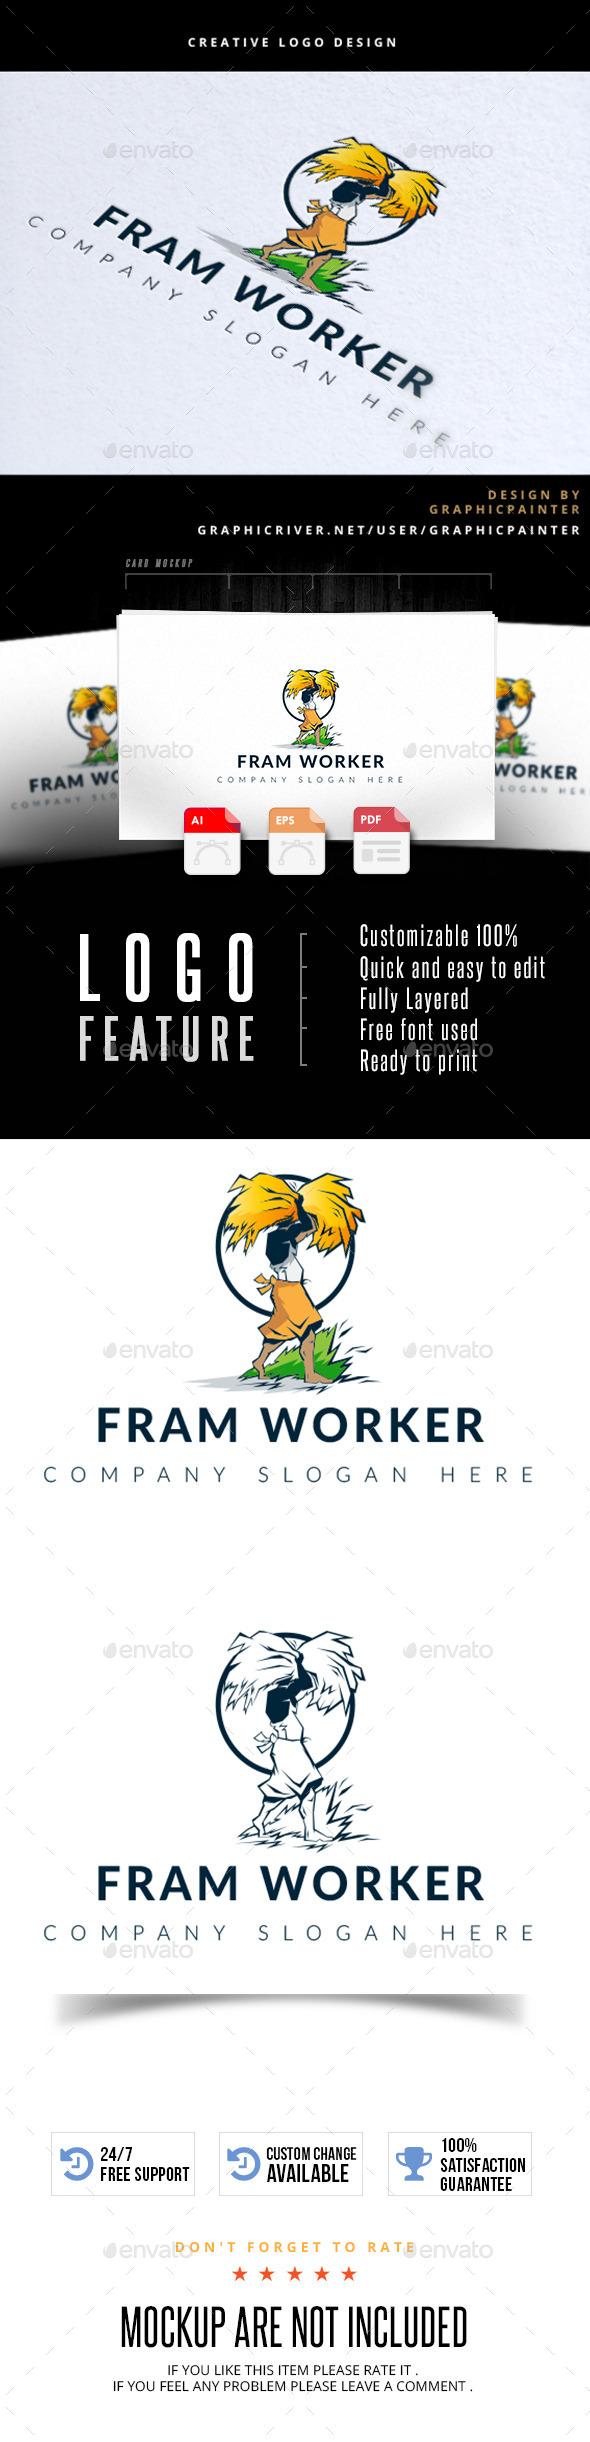 GraphicRiver Fram Worker 11817868